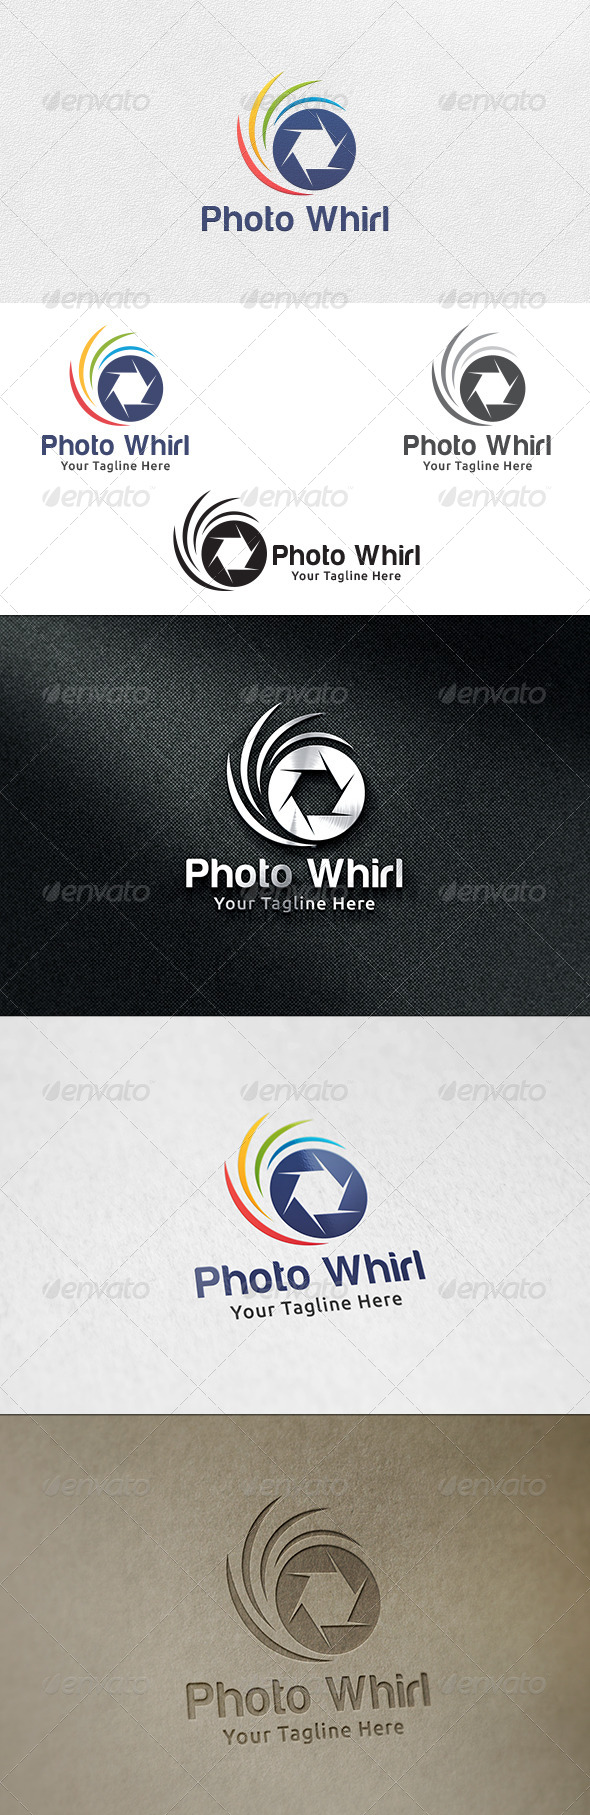 GraphicRiver Photo Whirl Logo Template 6485957